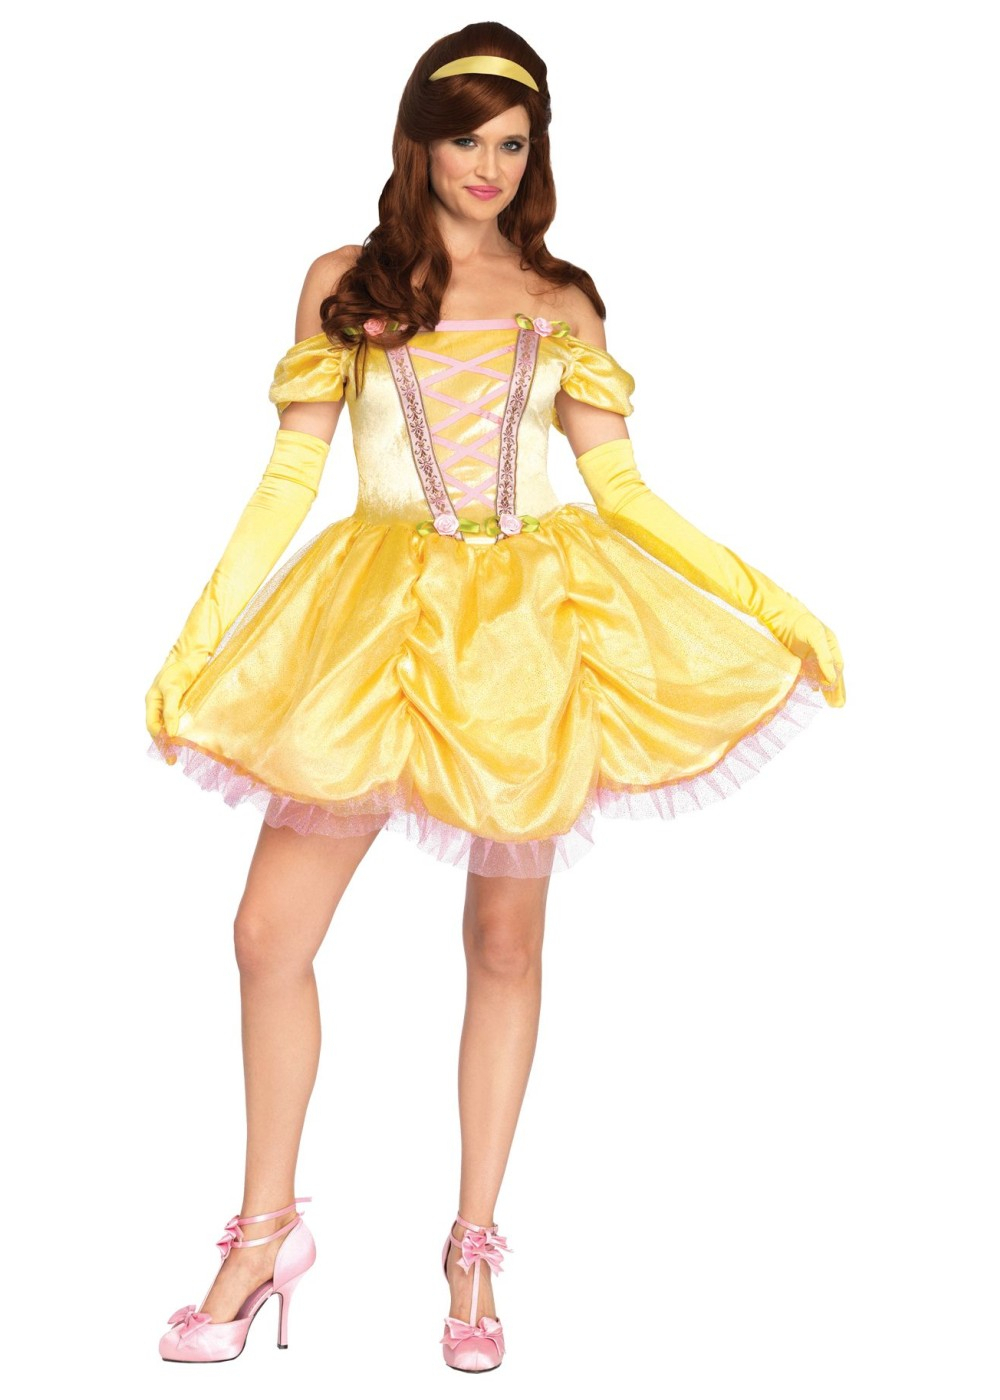 princess belle women costume - sexy costumes